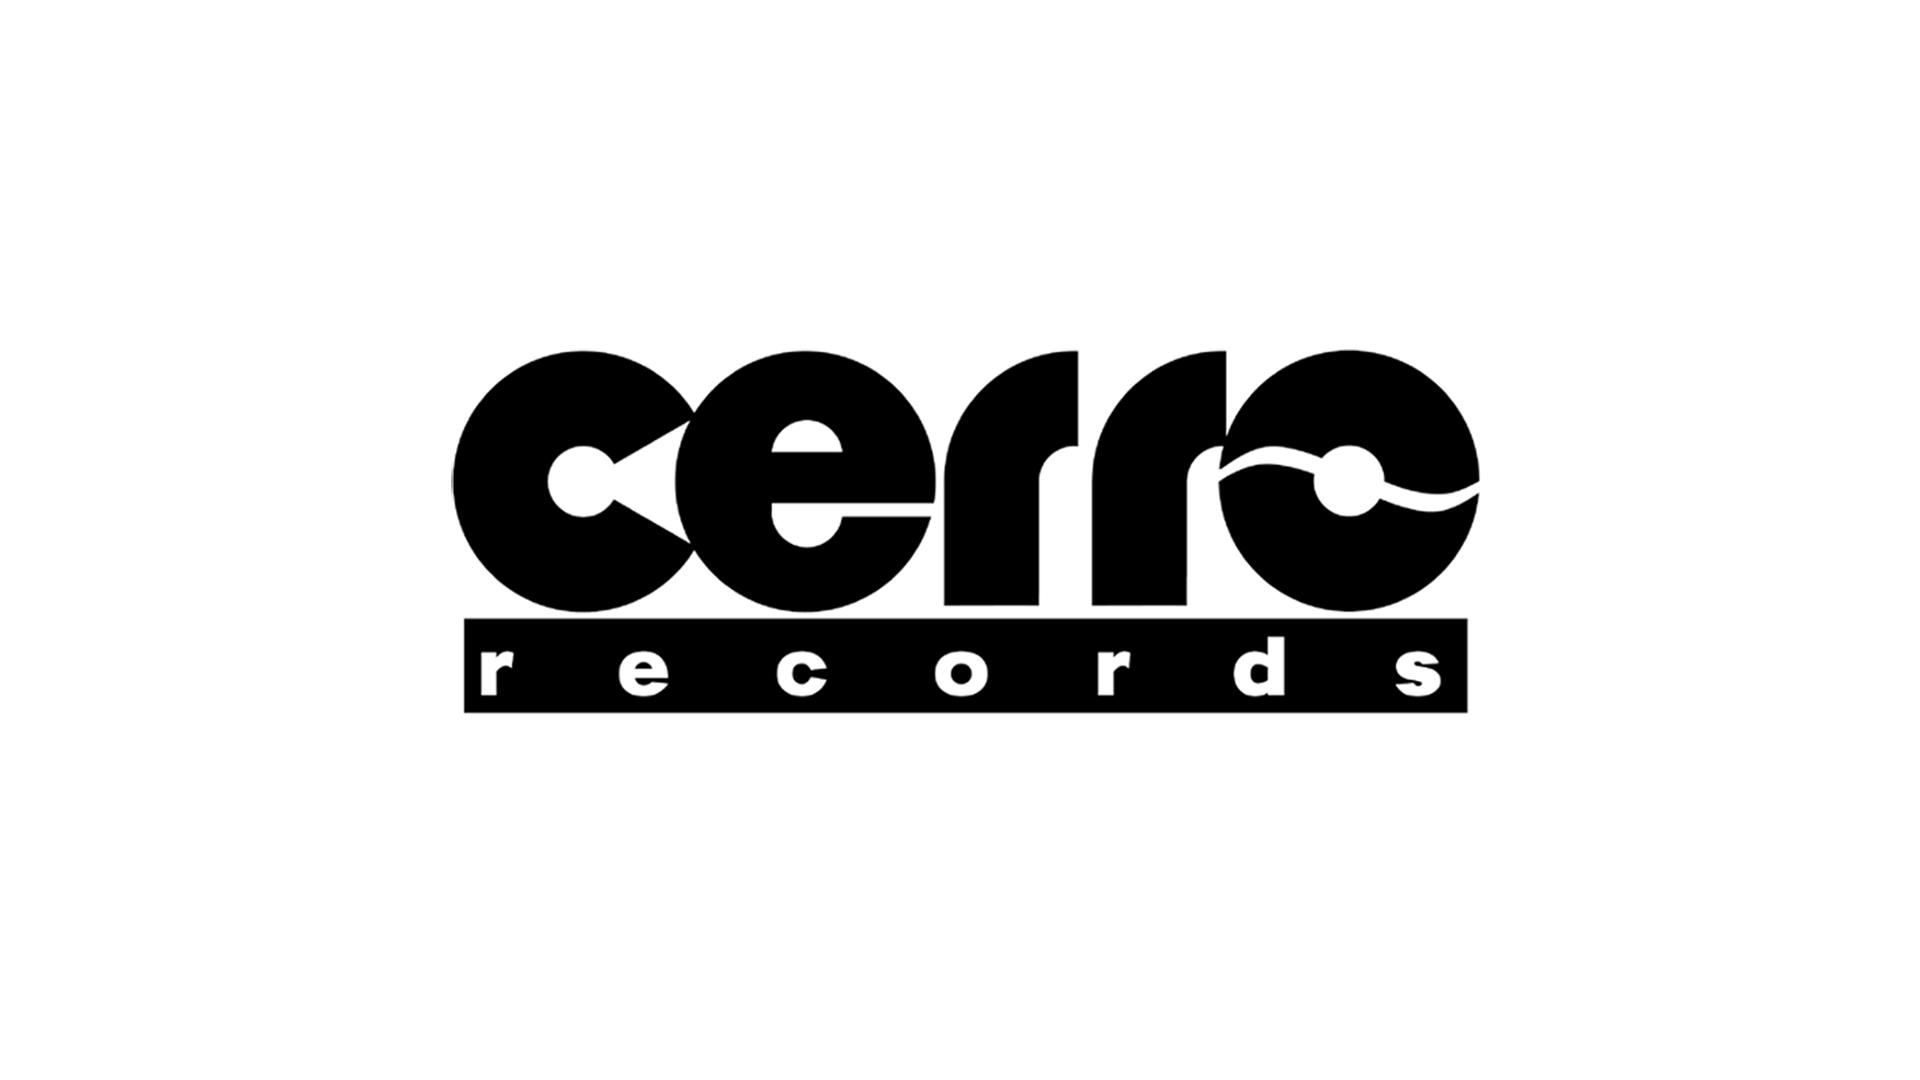 Cerro Records, Kaiserslautern Logo, Musik CDs